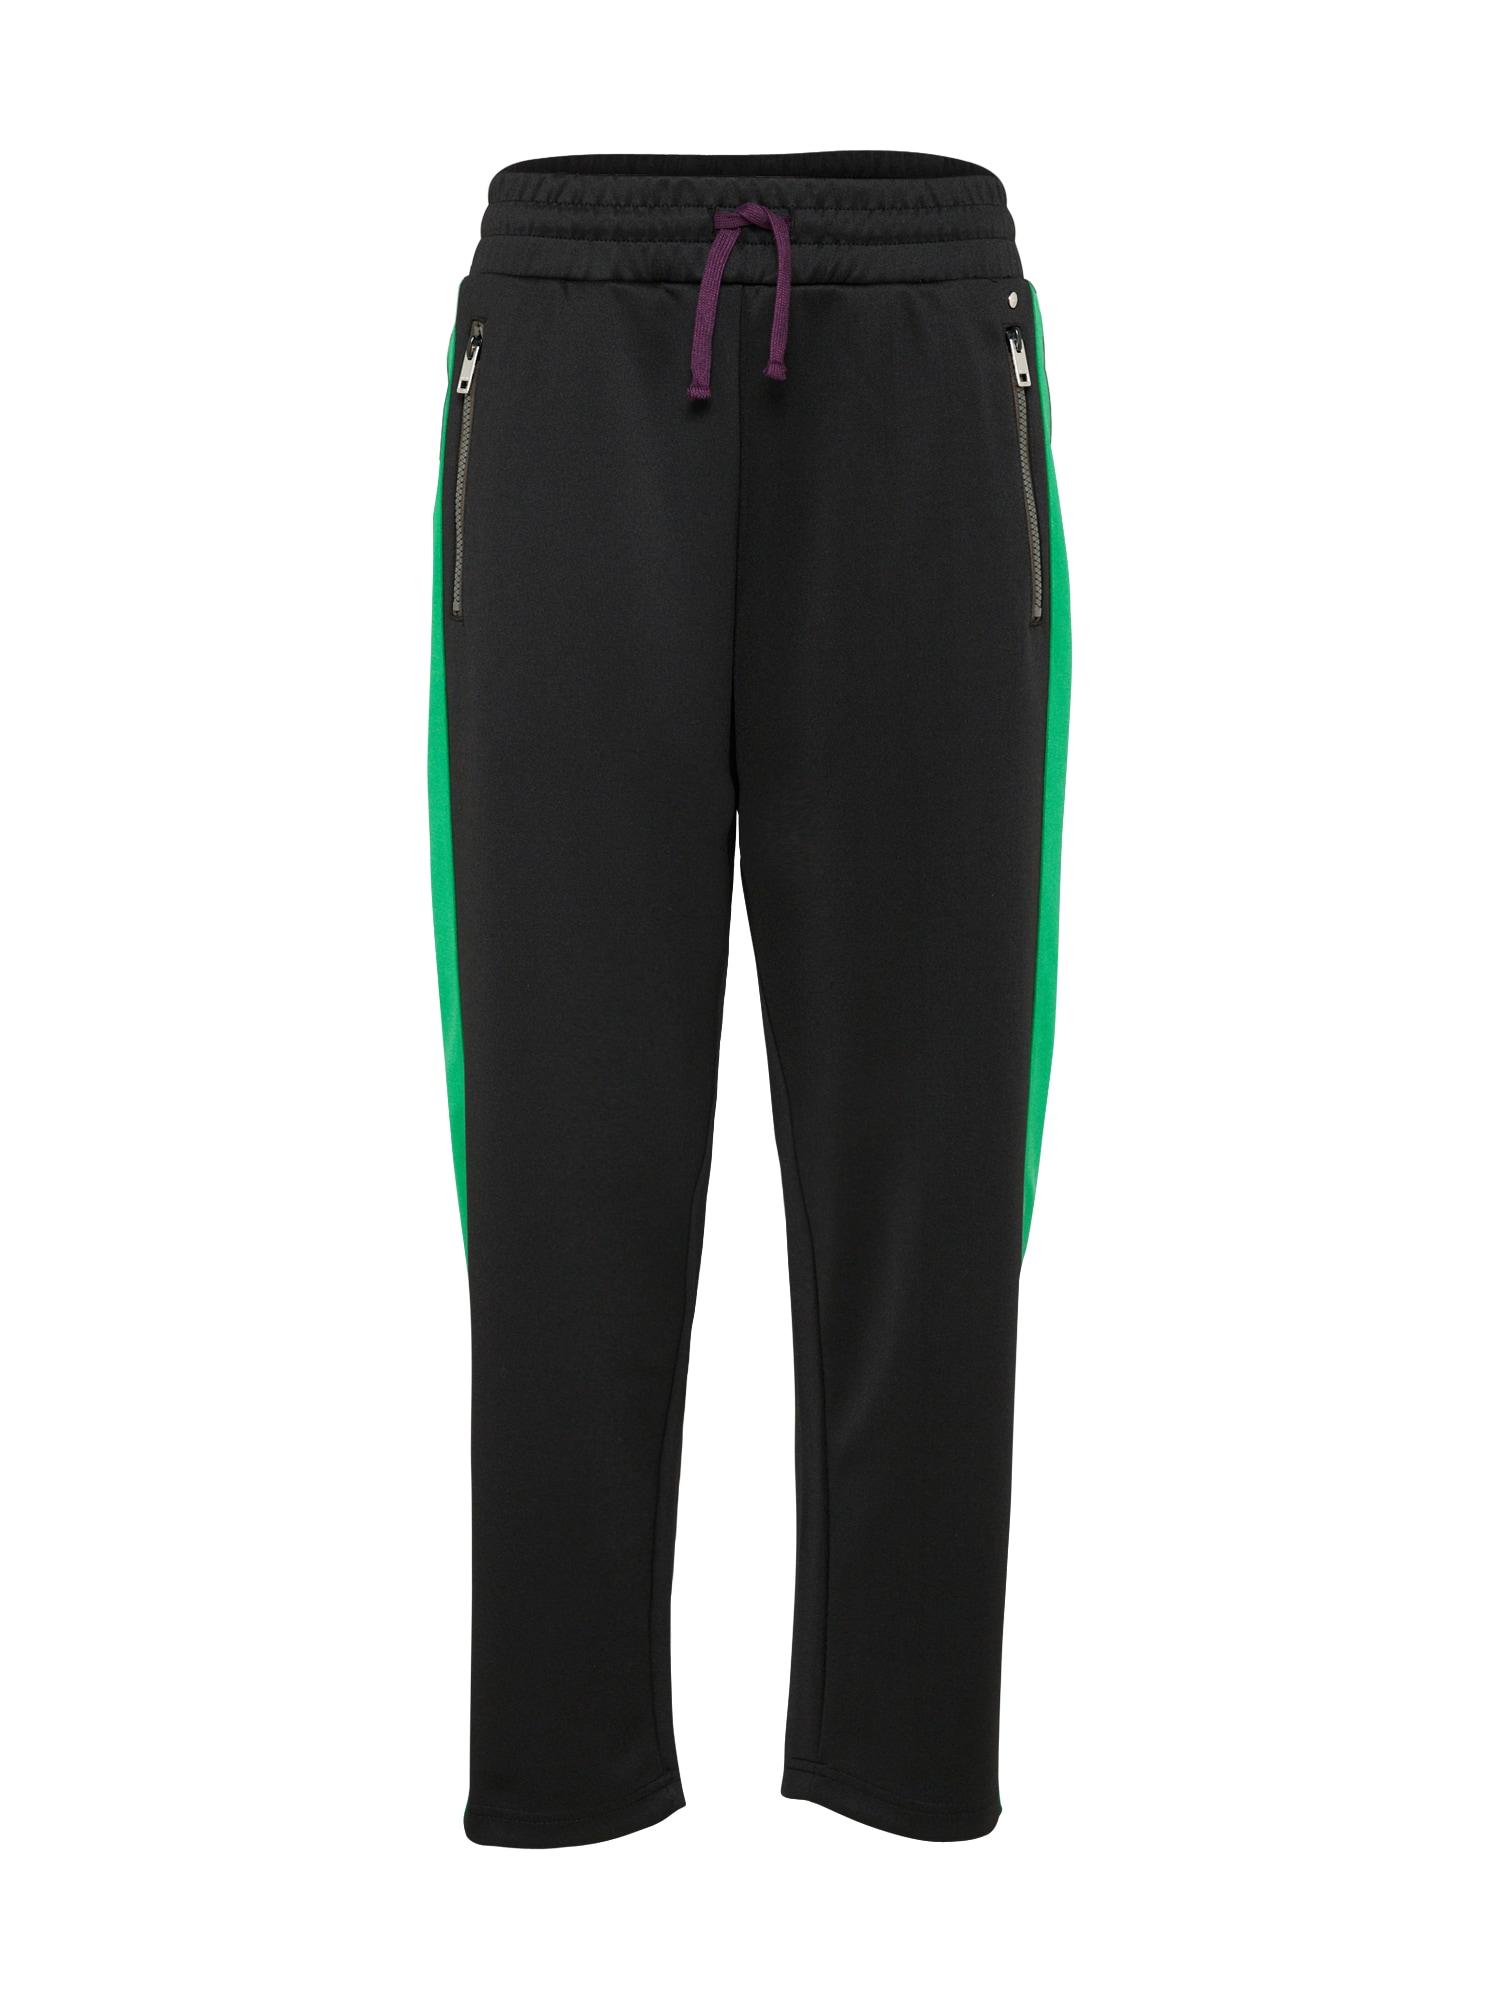 DIESEL Dames Broek P-LOGAN-A groen zwart